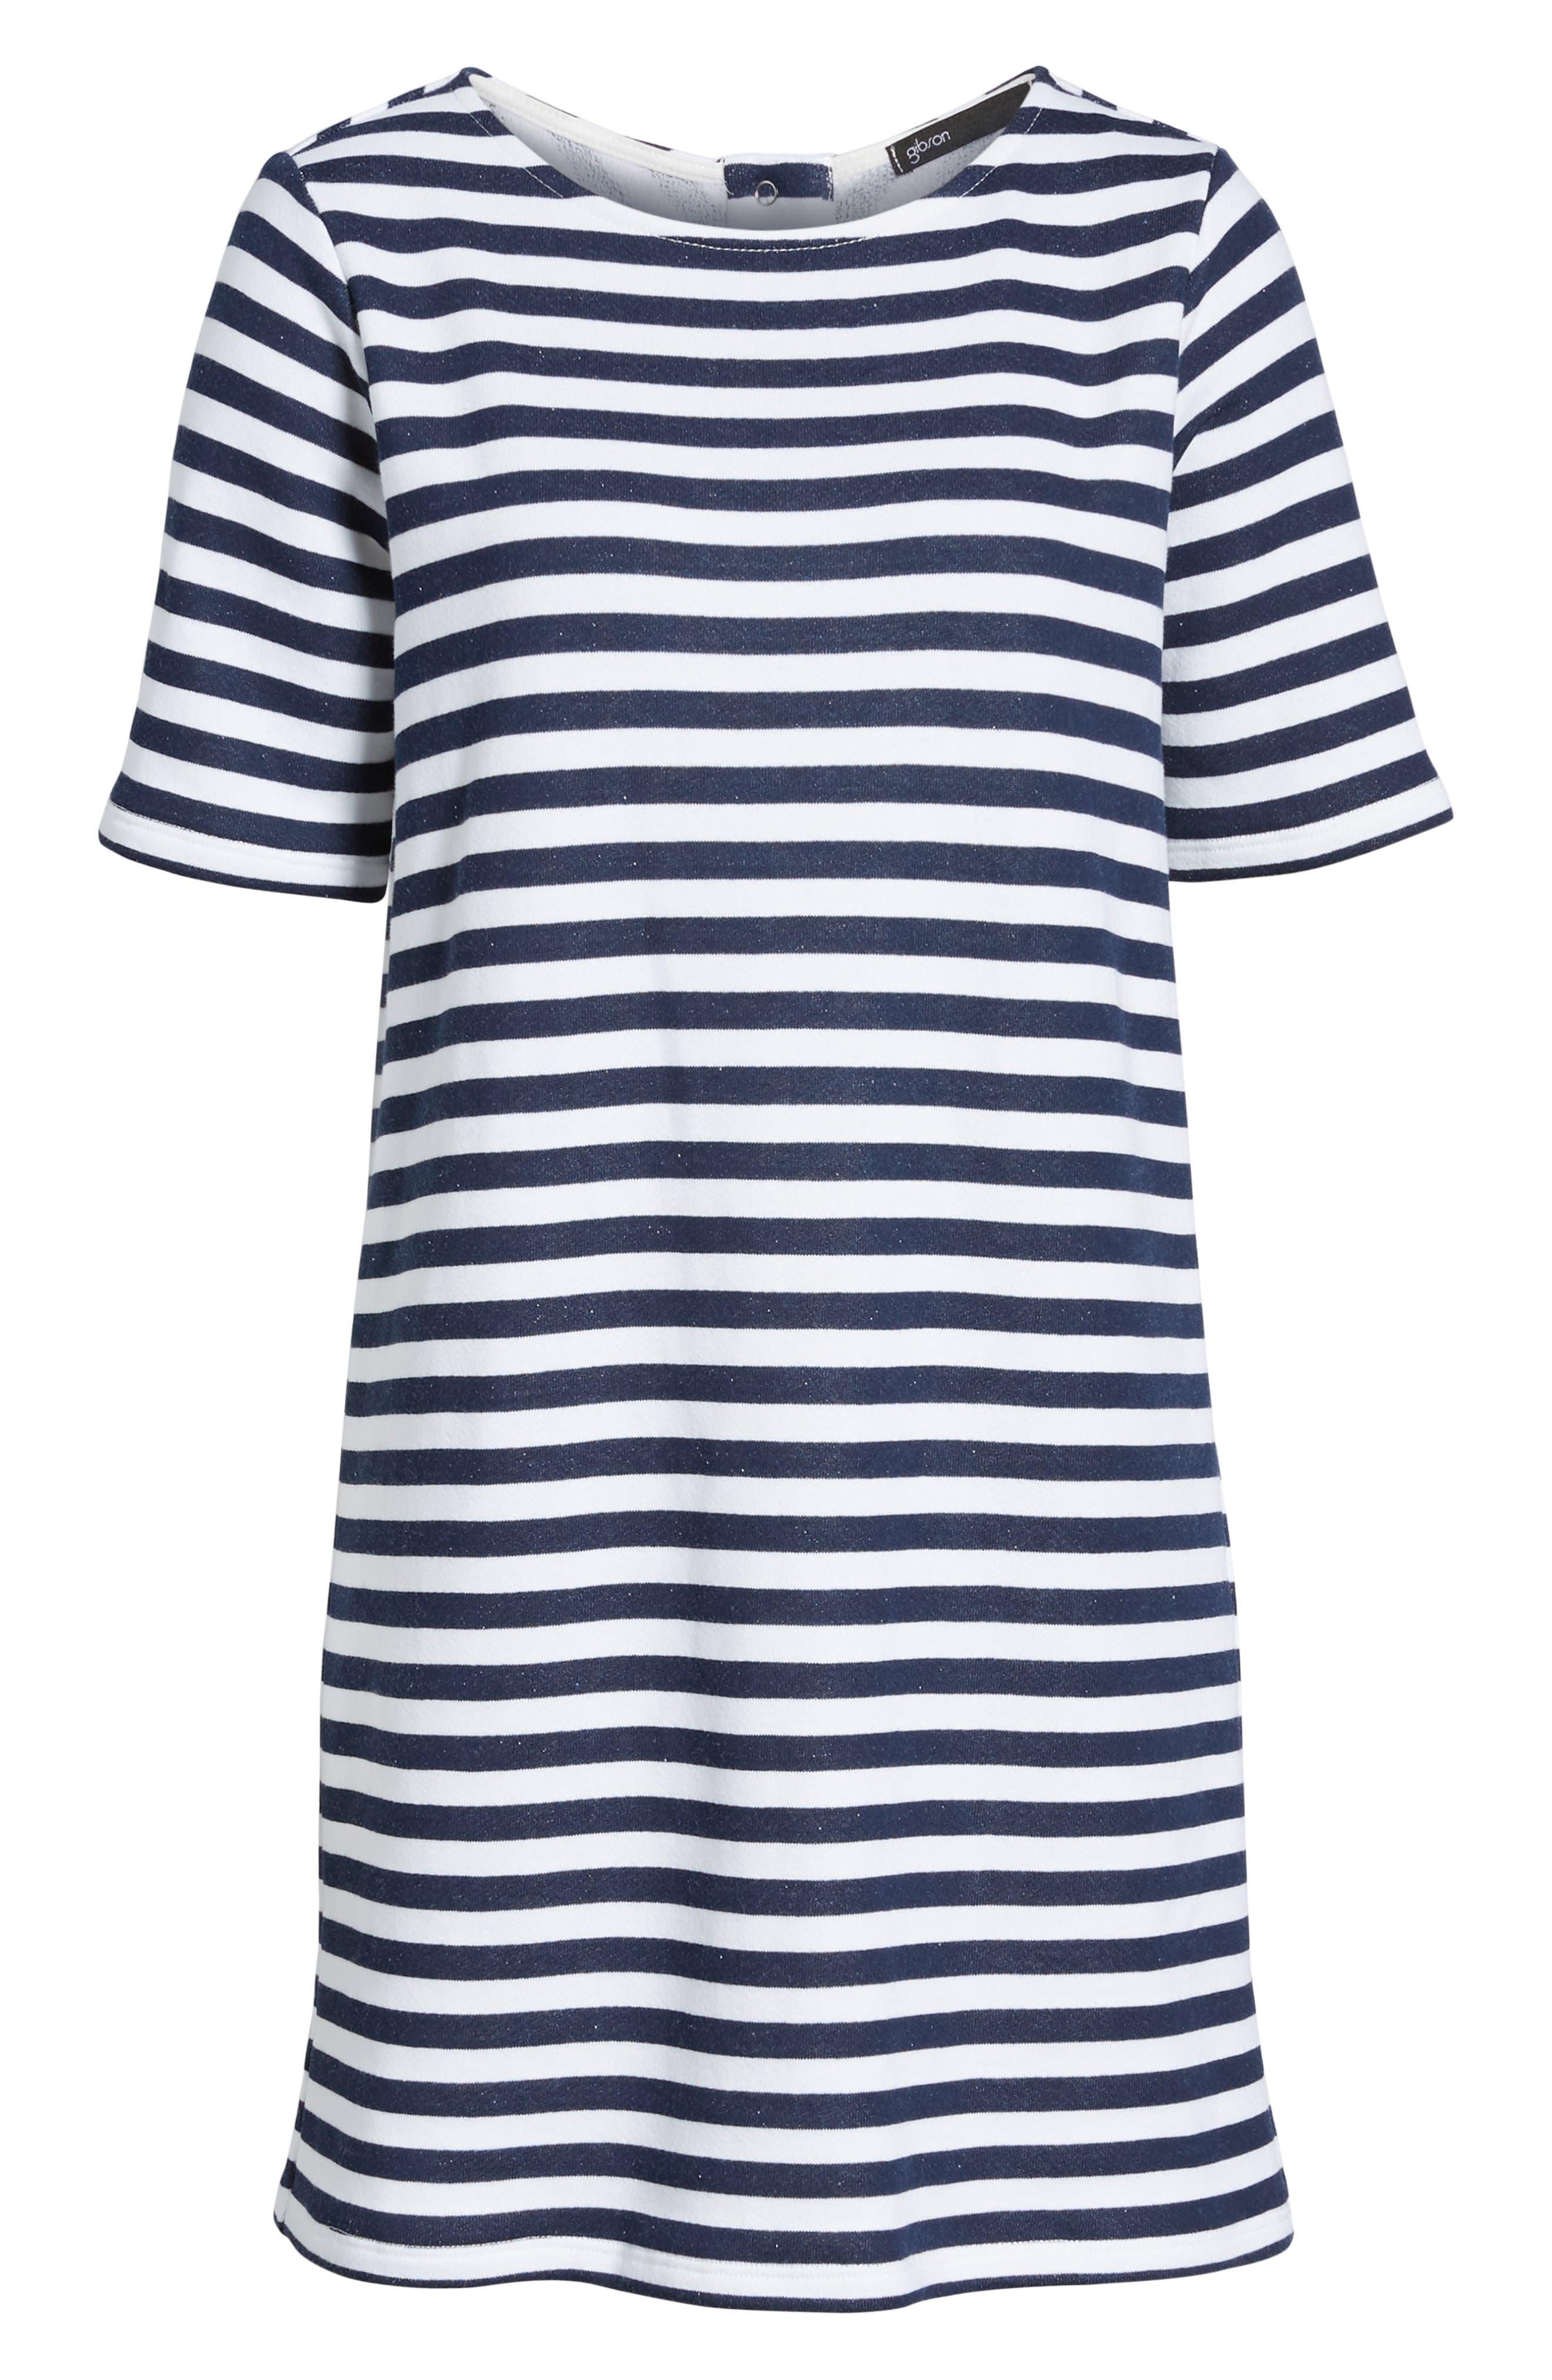 Pleat Back Minidress,                             Alternate thumbnail 6, color,                             Navy/ Ivory Stripe